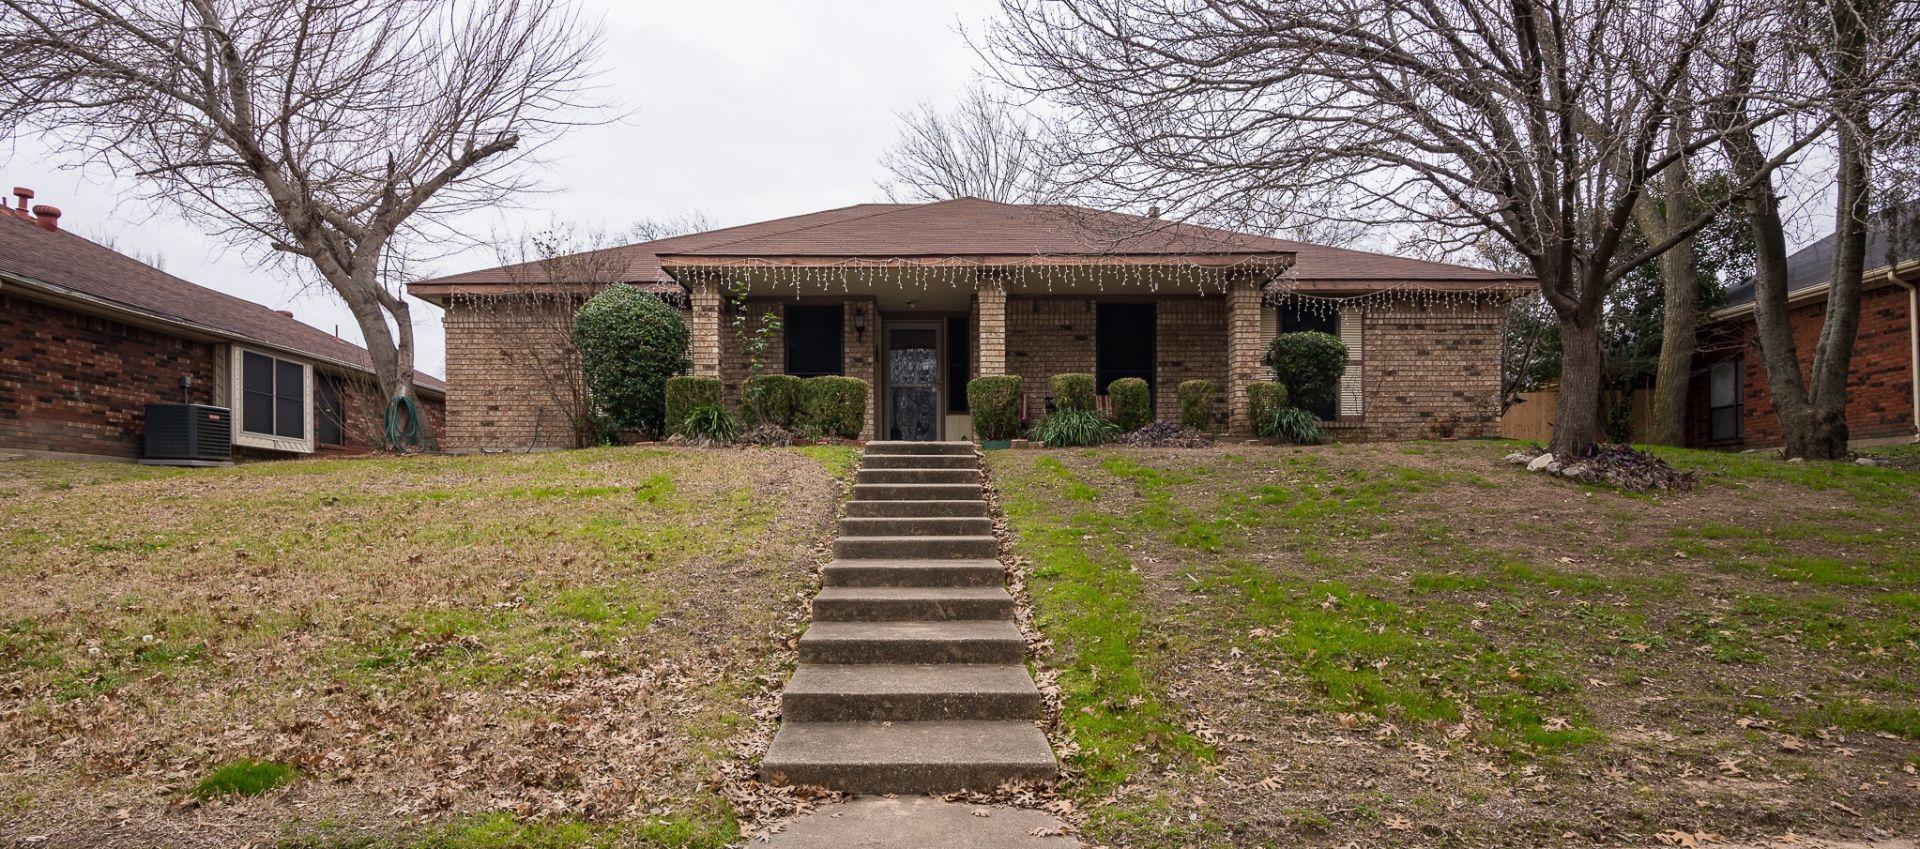 Single Level Home For Sale in DeSoto